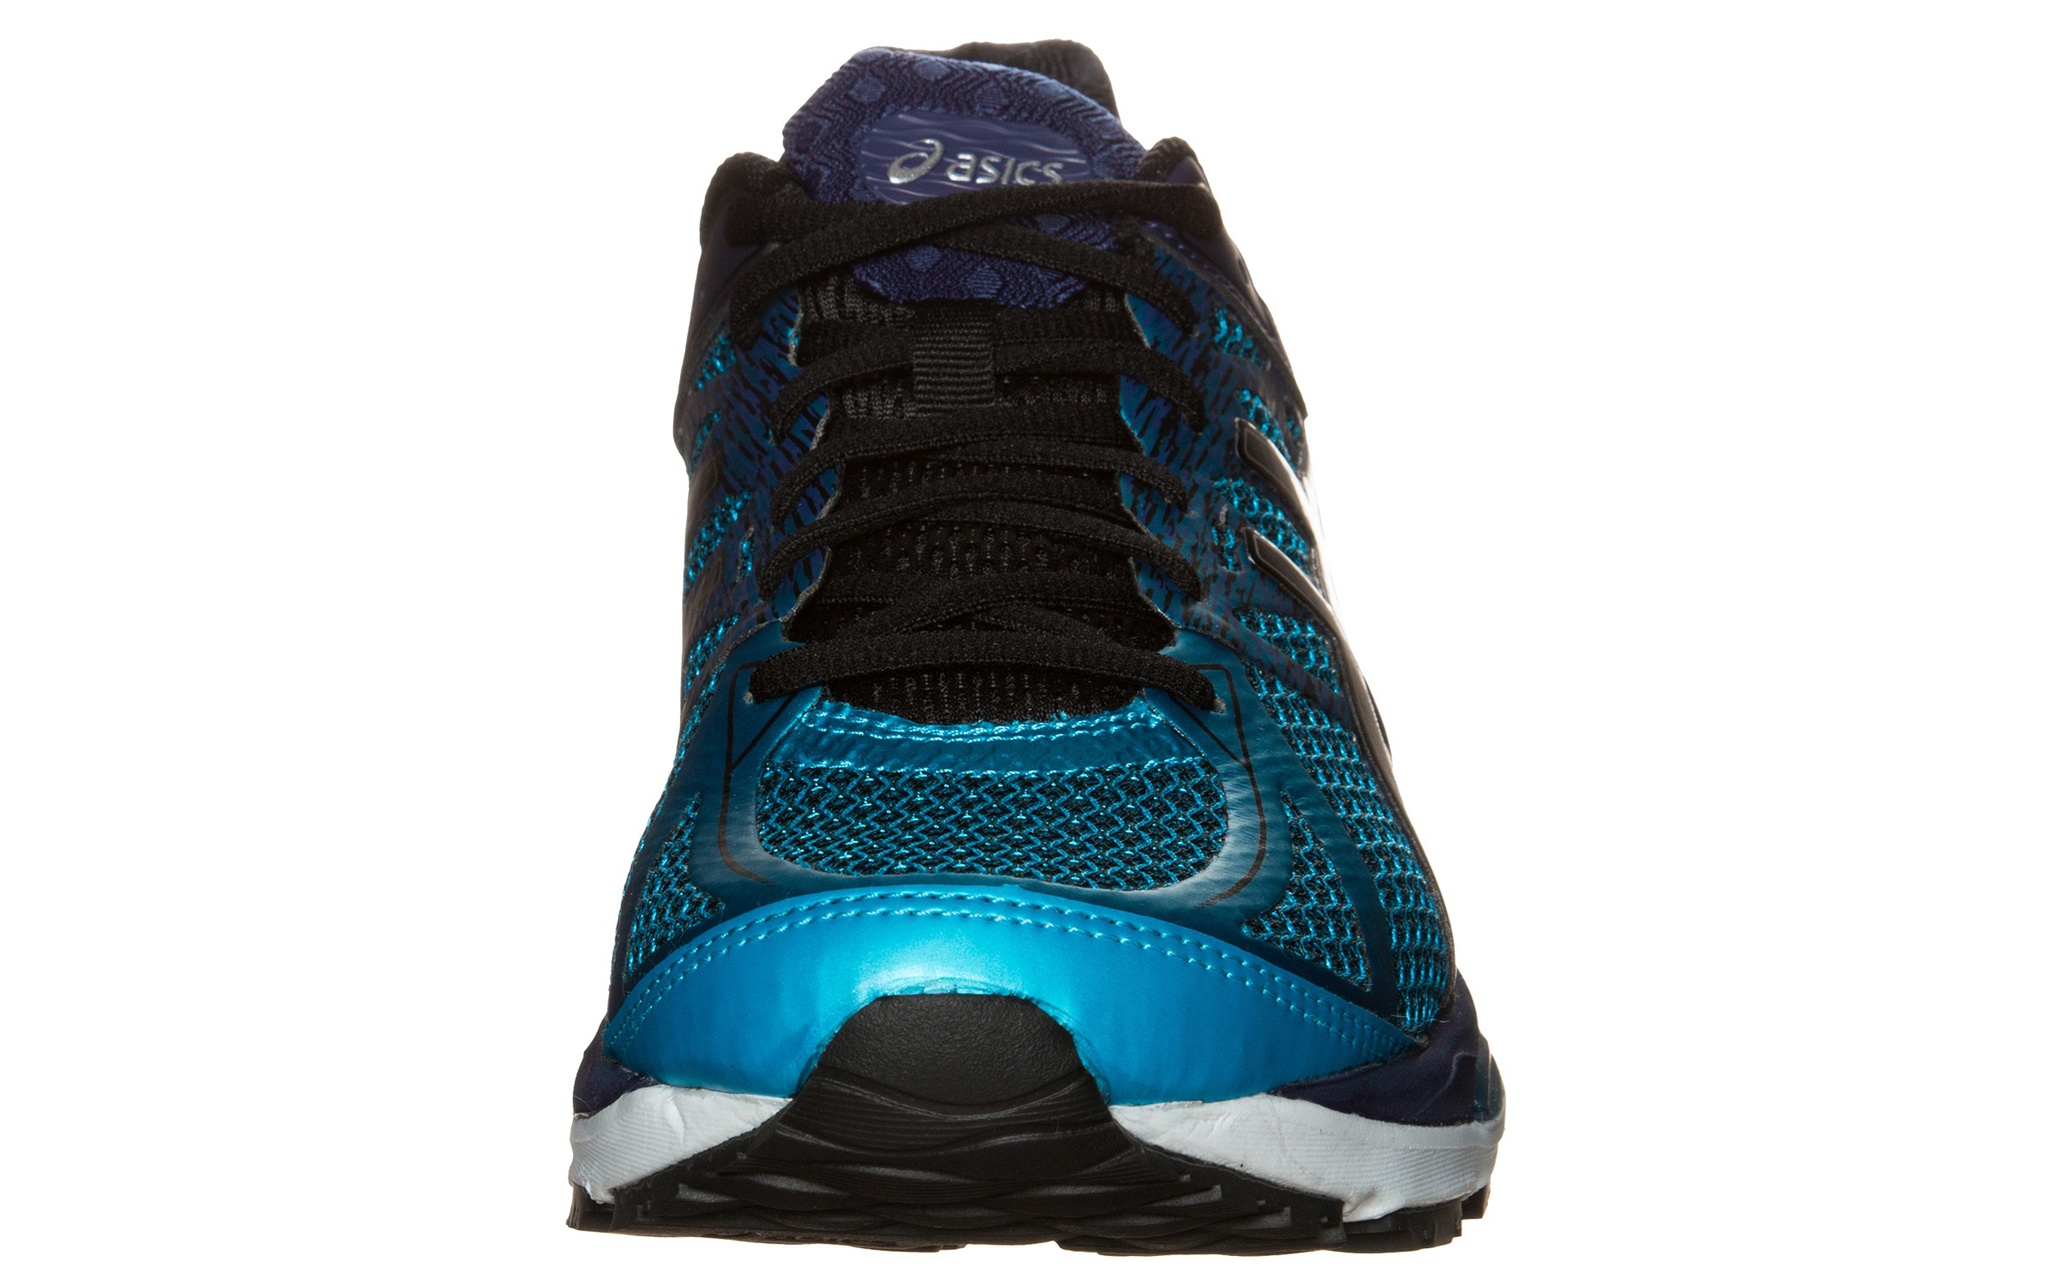 Мужская обувь для бега Asics Gel-Cumulus 17 (T5D3N 4090) фото